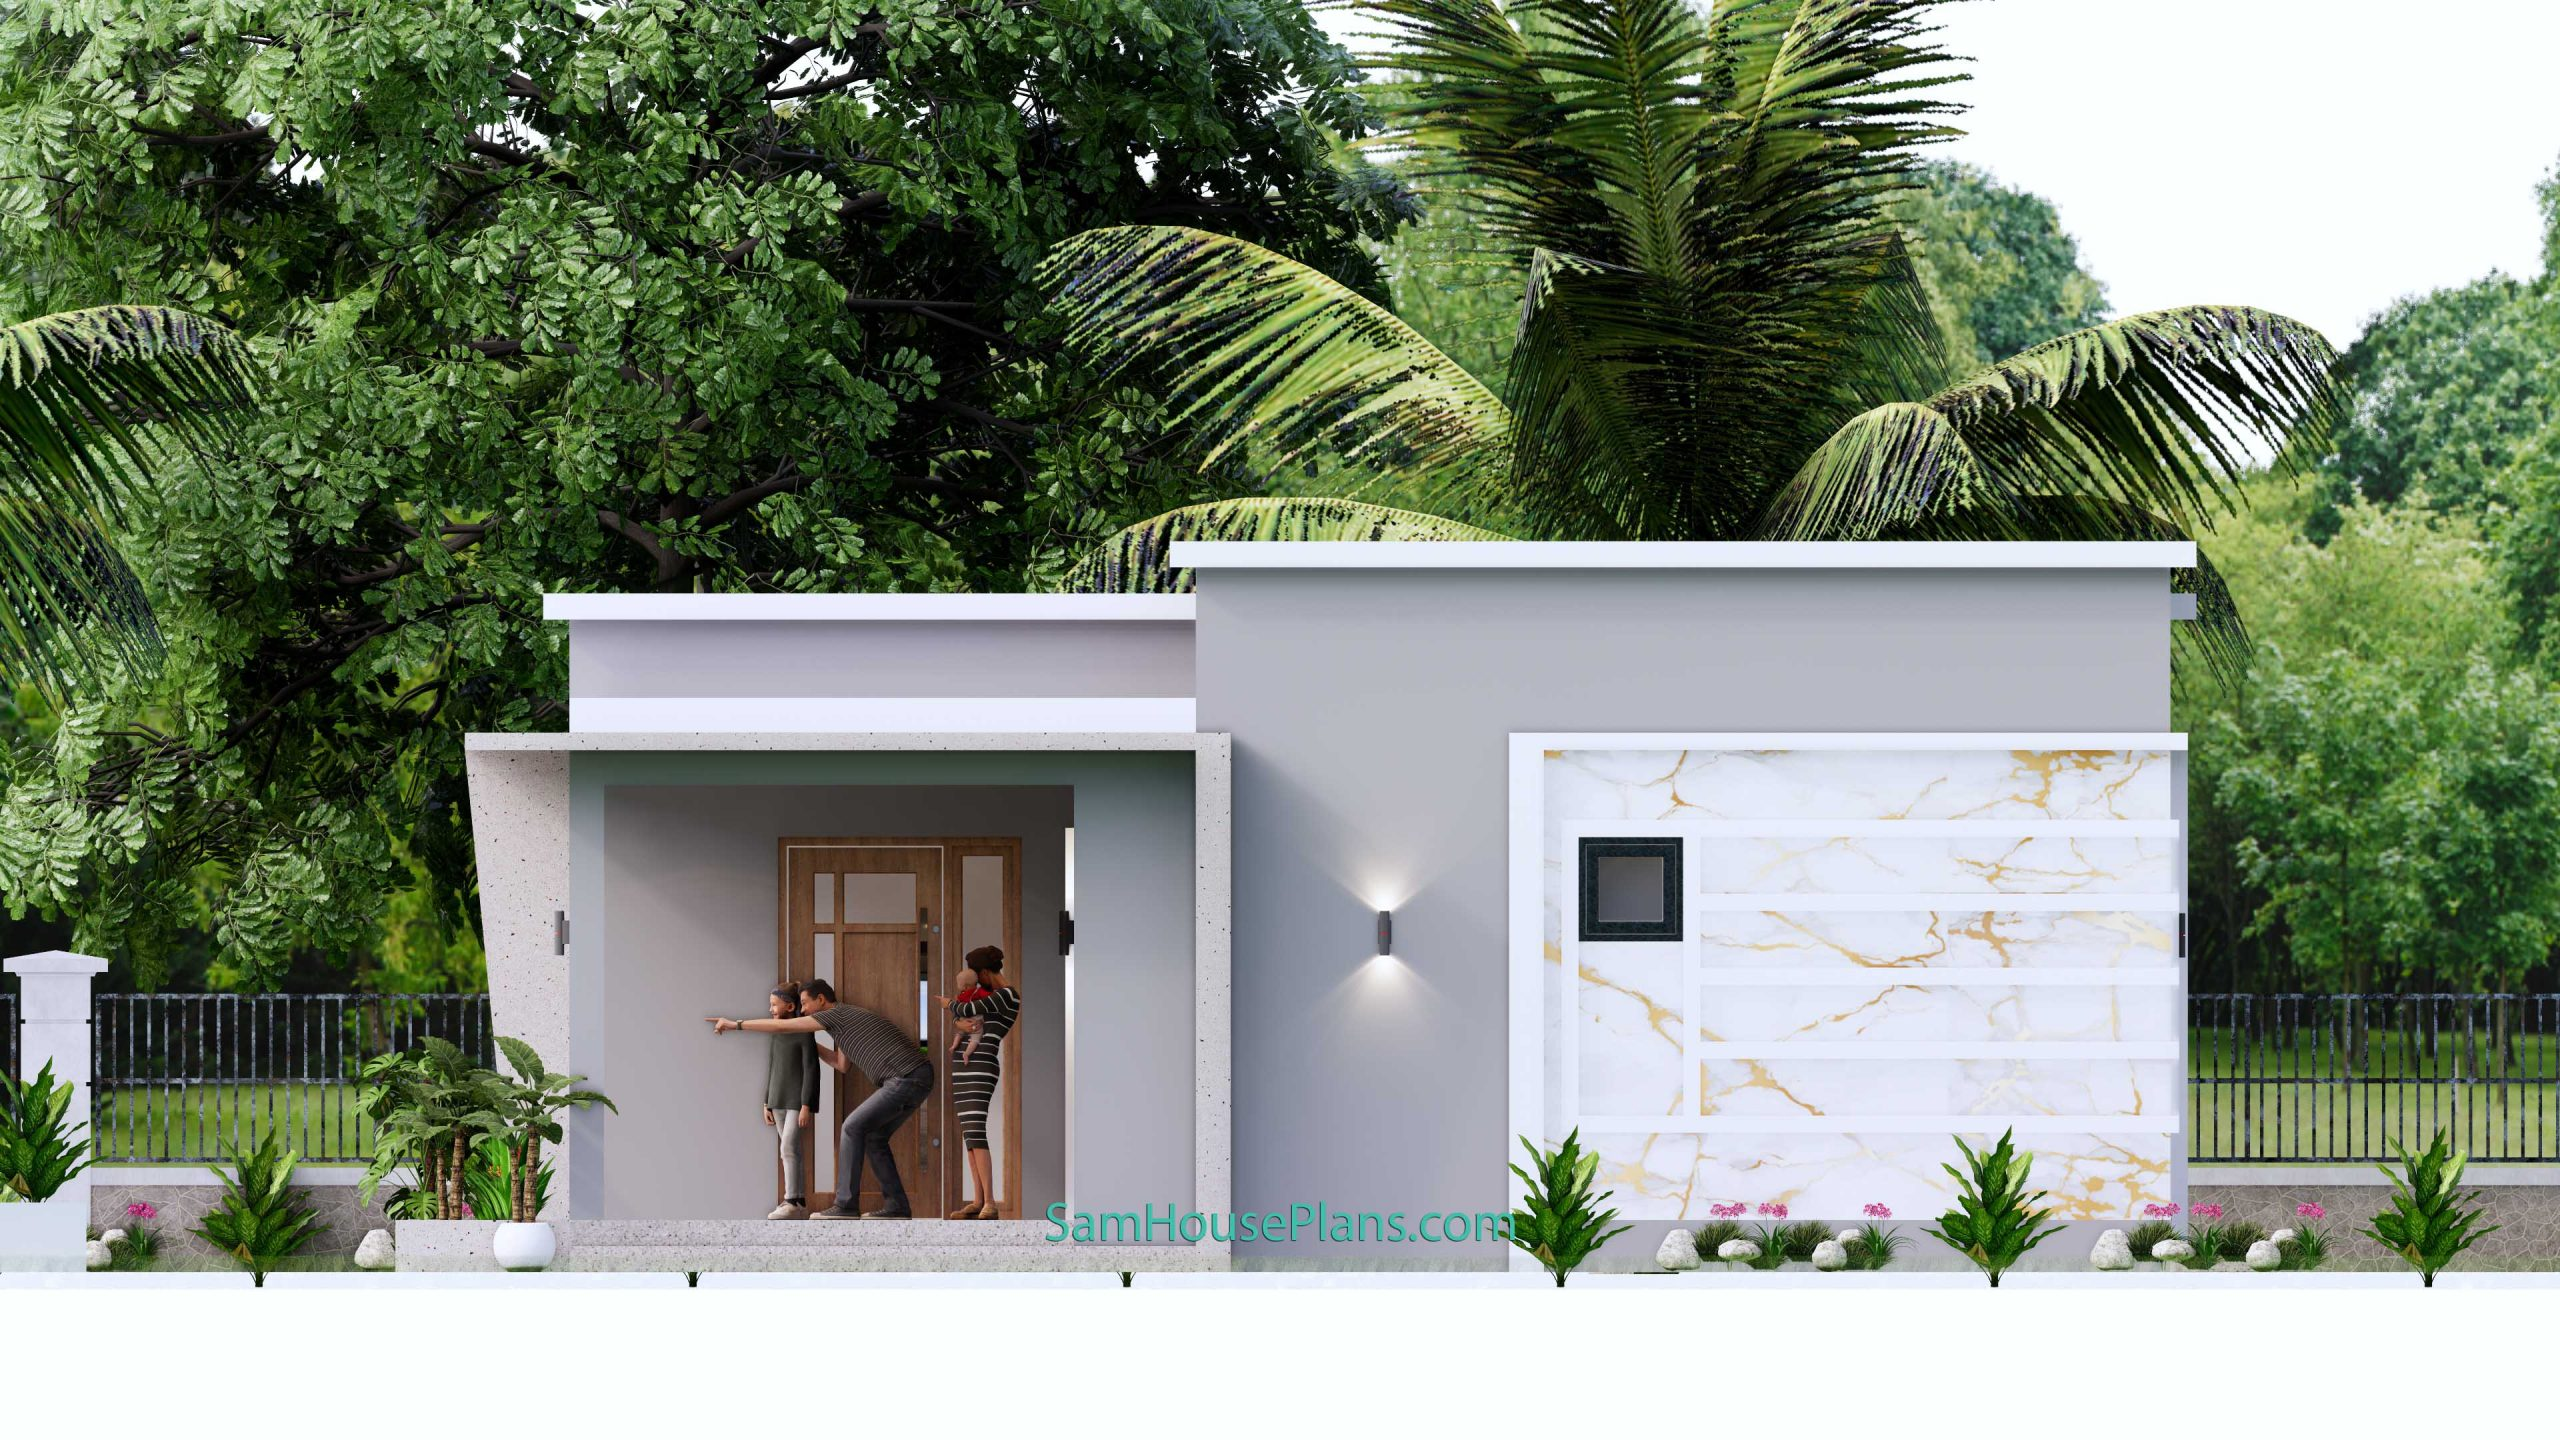 Right elevation Modern House Design 15x9 M 49x30 Feet 3 Beds PDF Plan